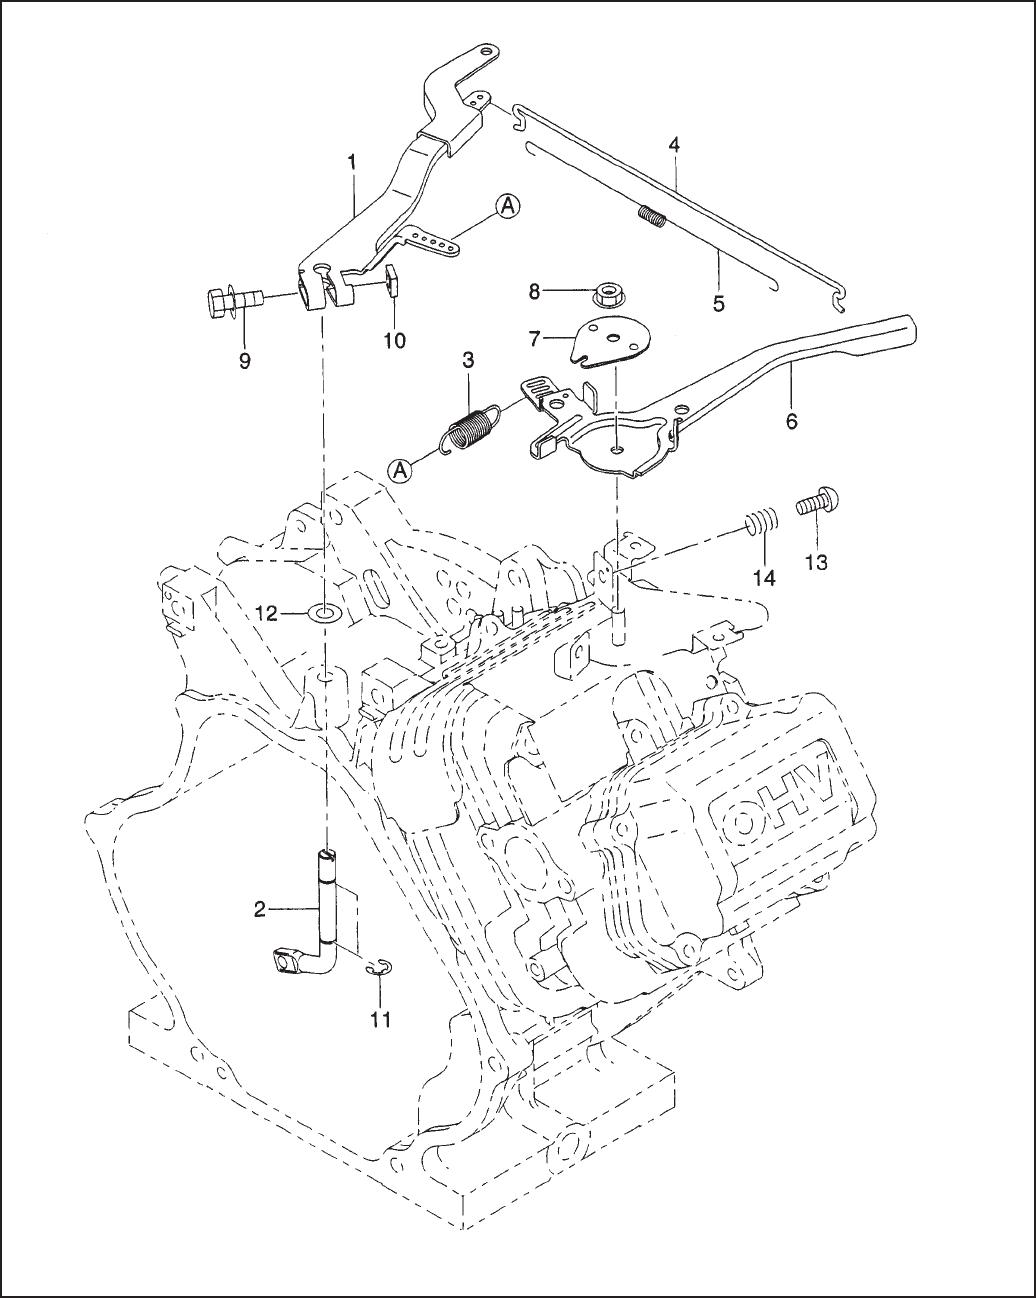 RGV7500 GENERATOR Parts Manual